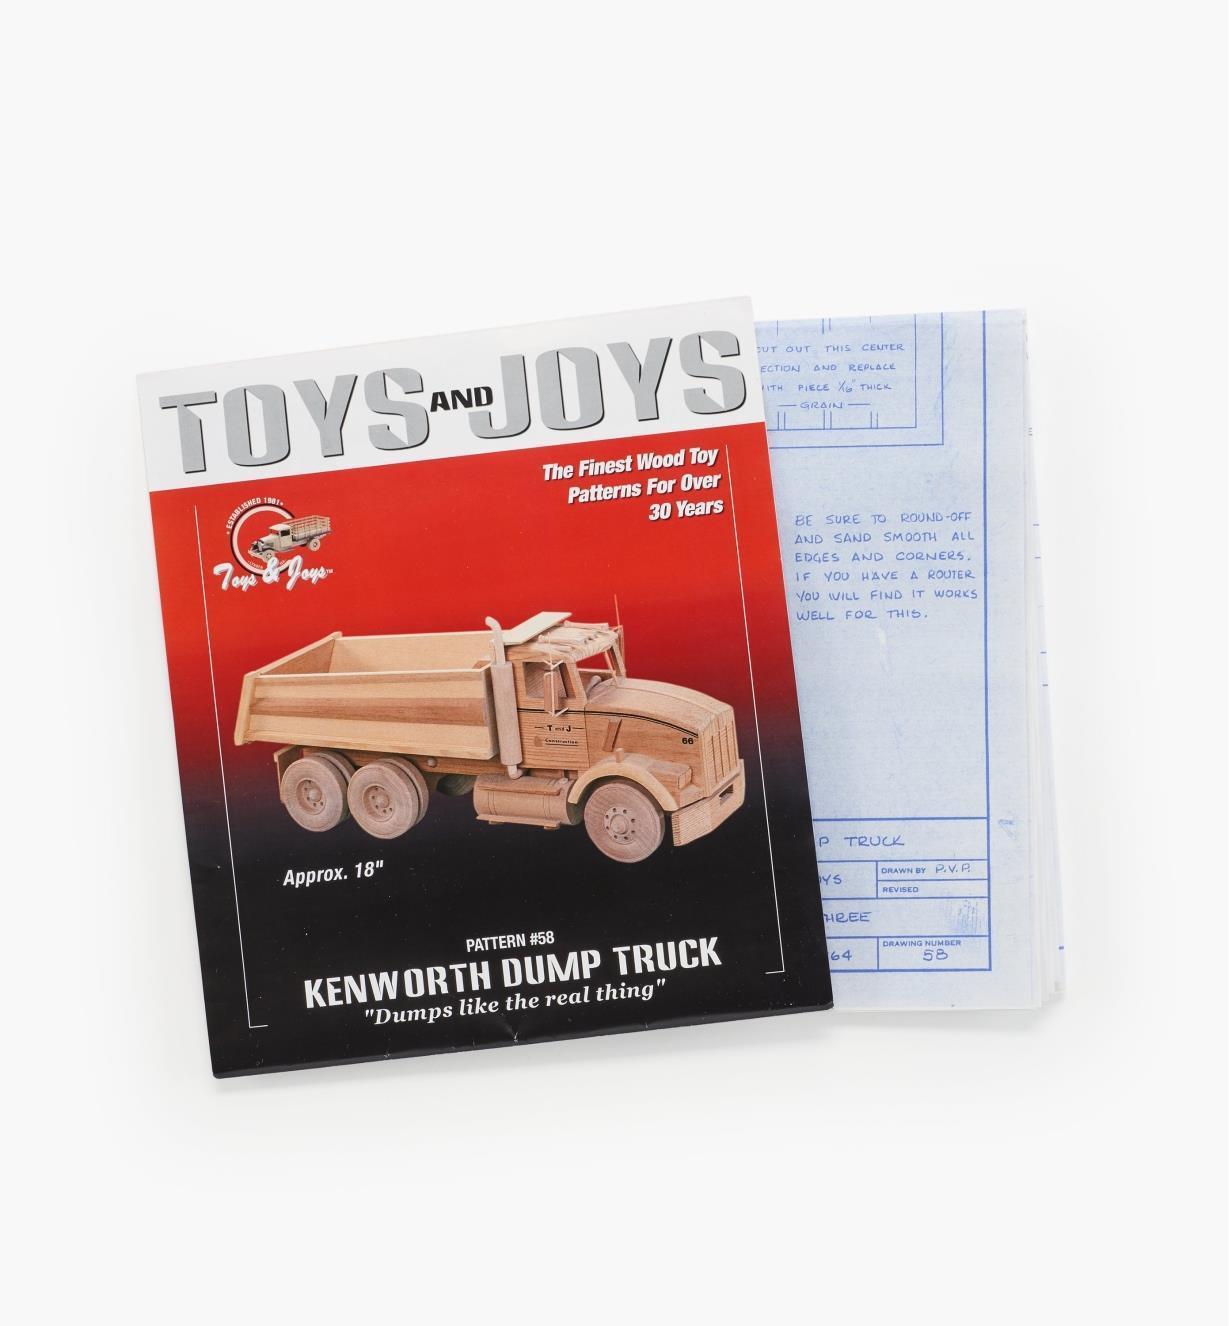 26L1003 - Kenworth Dump Truck Plan